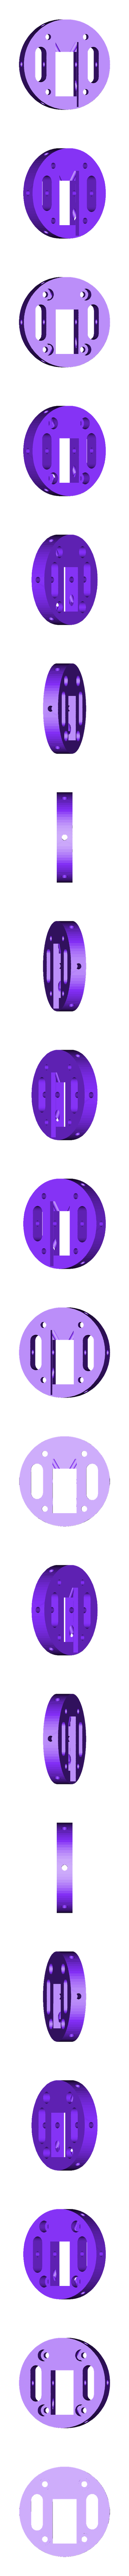 maru.stl Descargar archivo STL gratis Plataforma giratoria de robot • Plan para la impresión en 3D, choimoni